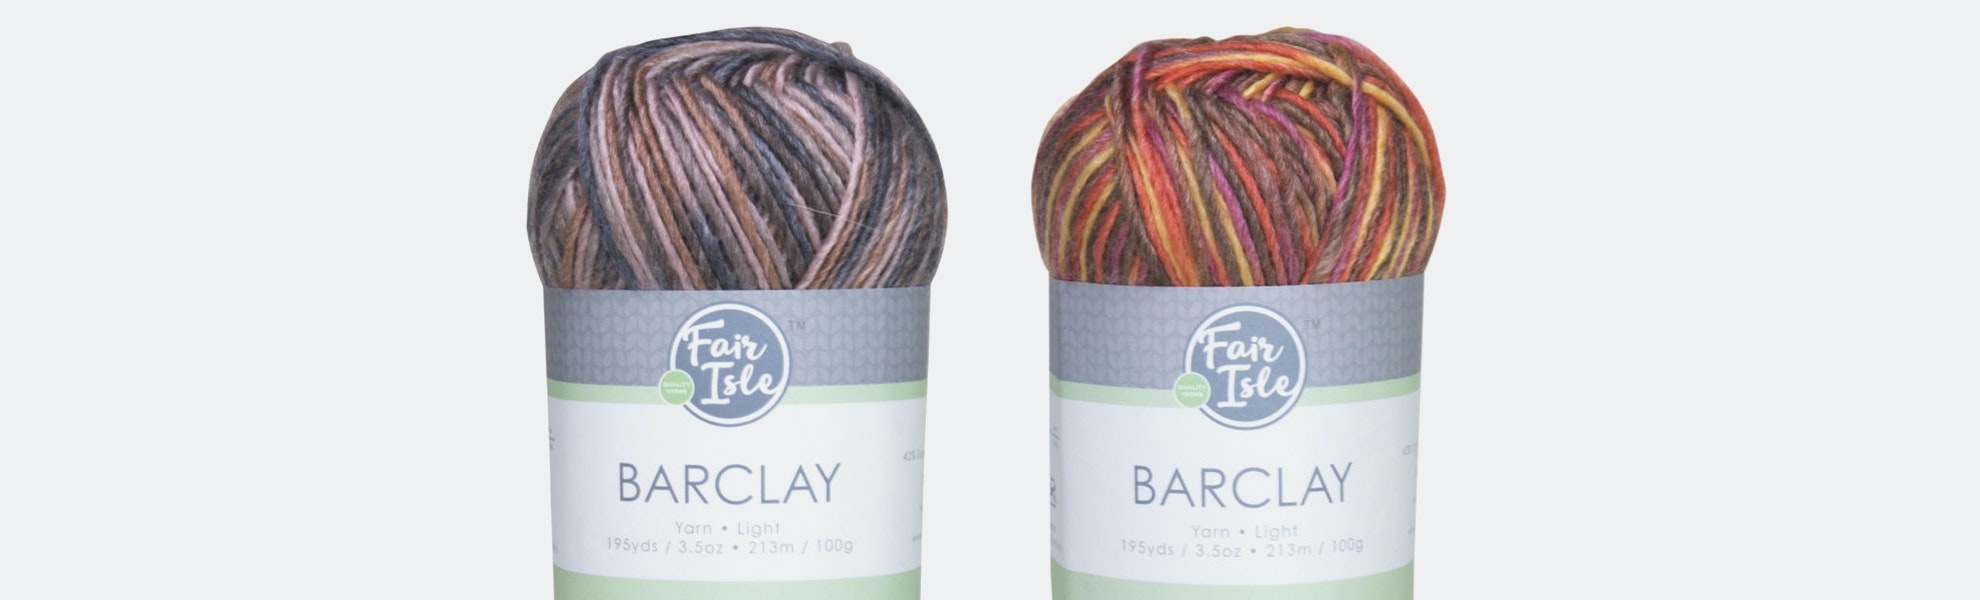 Barclay Yarn by Fair Isle (2-Pack) | Price & Reviews | Massdrop